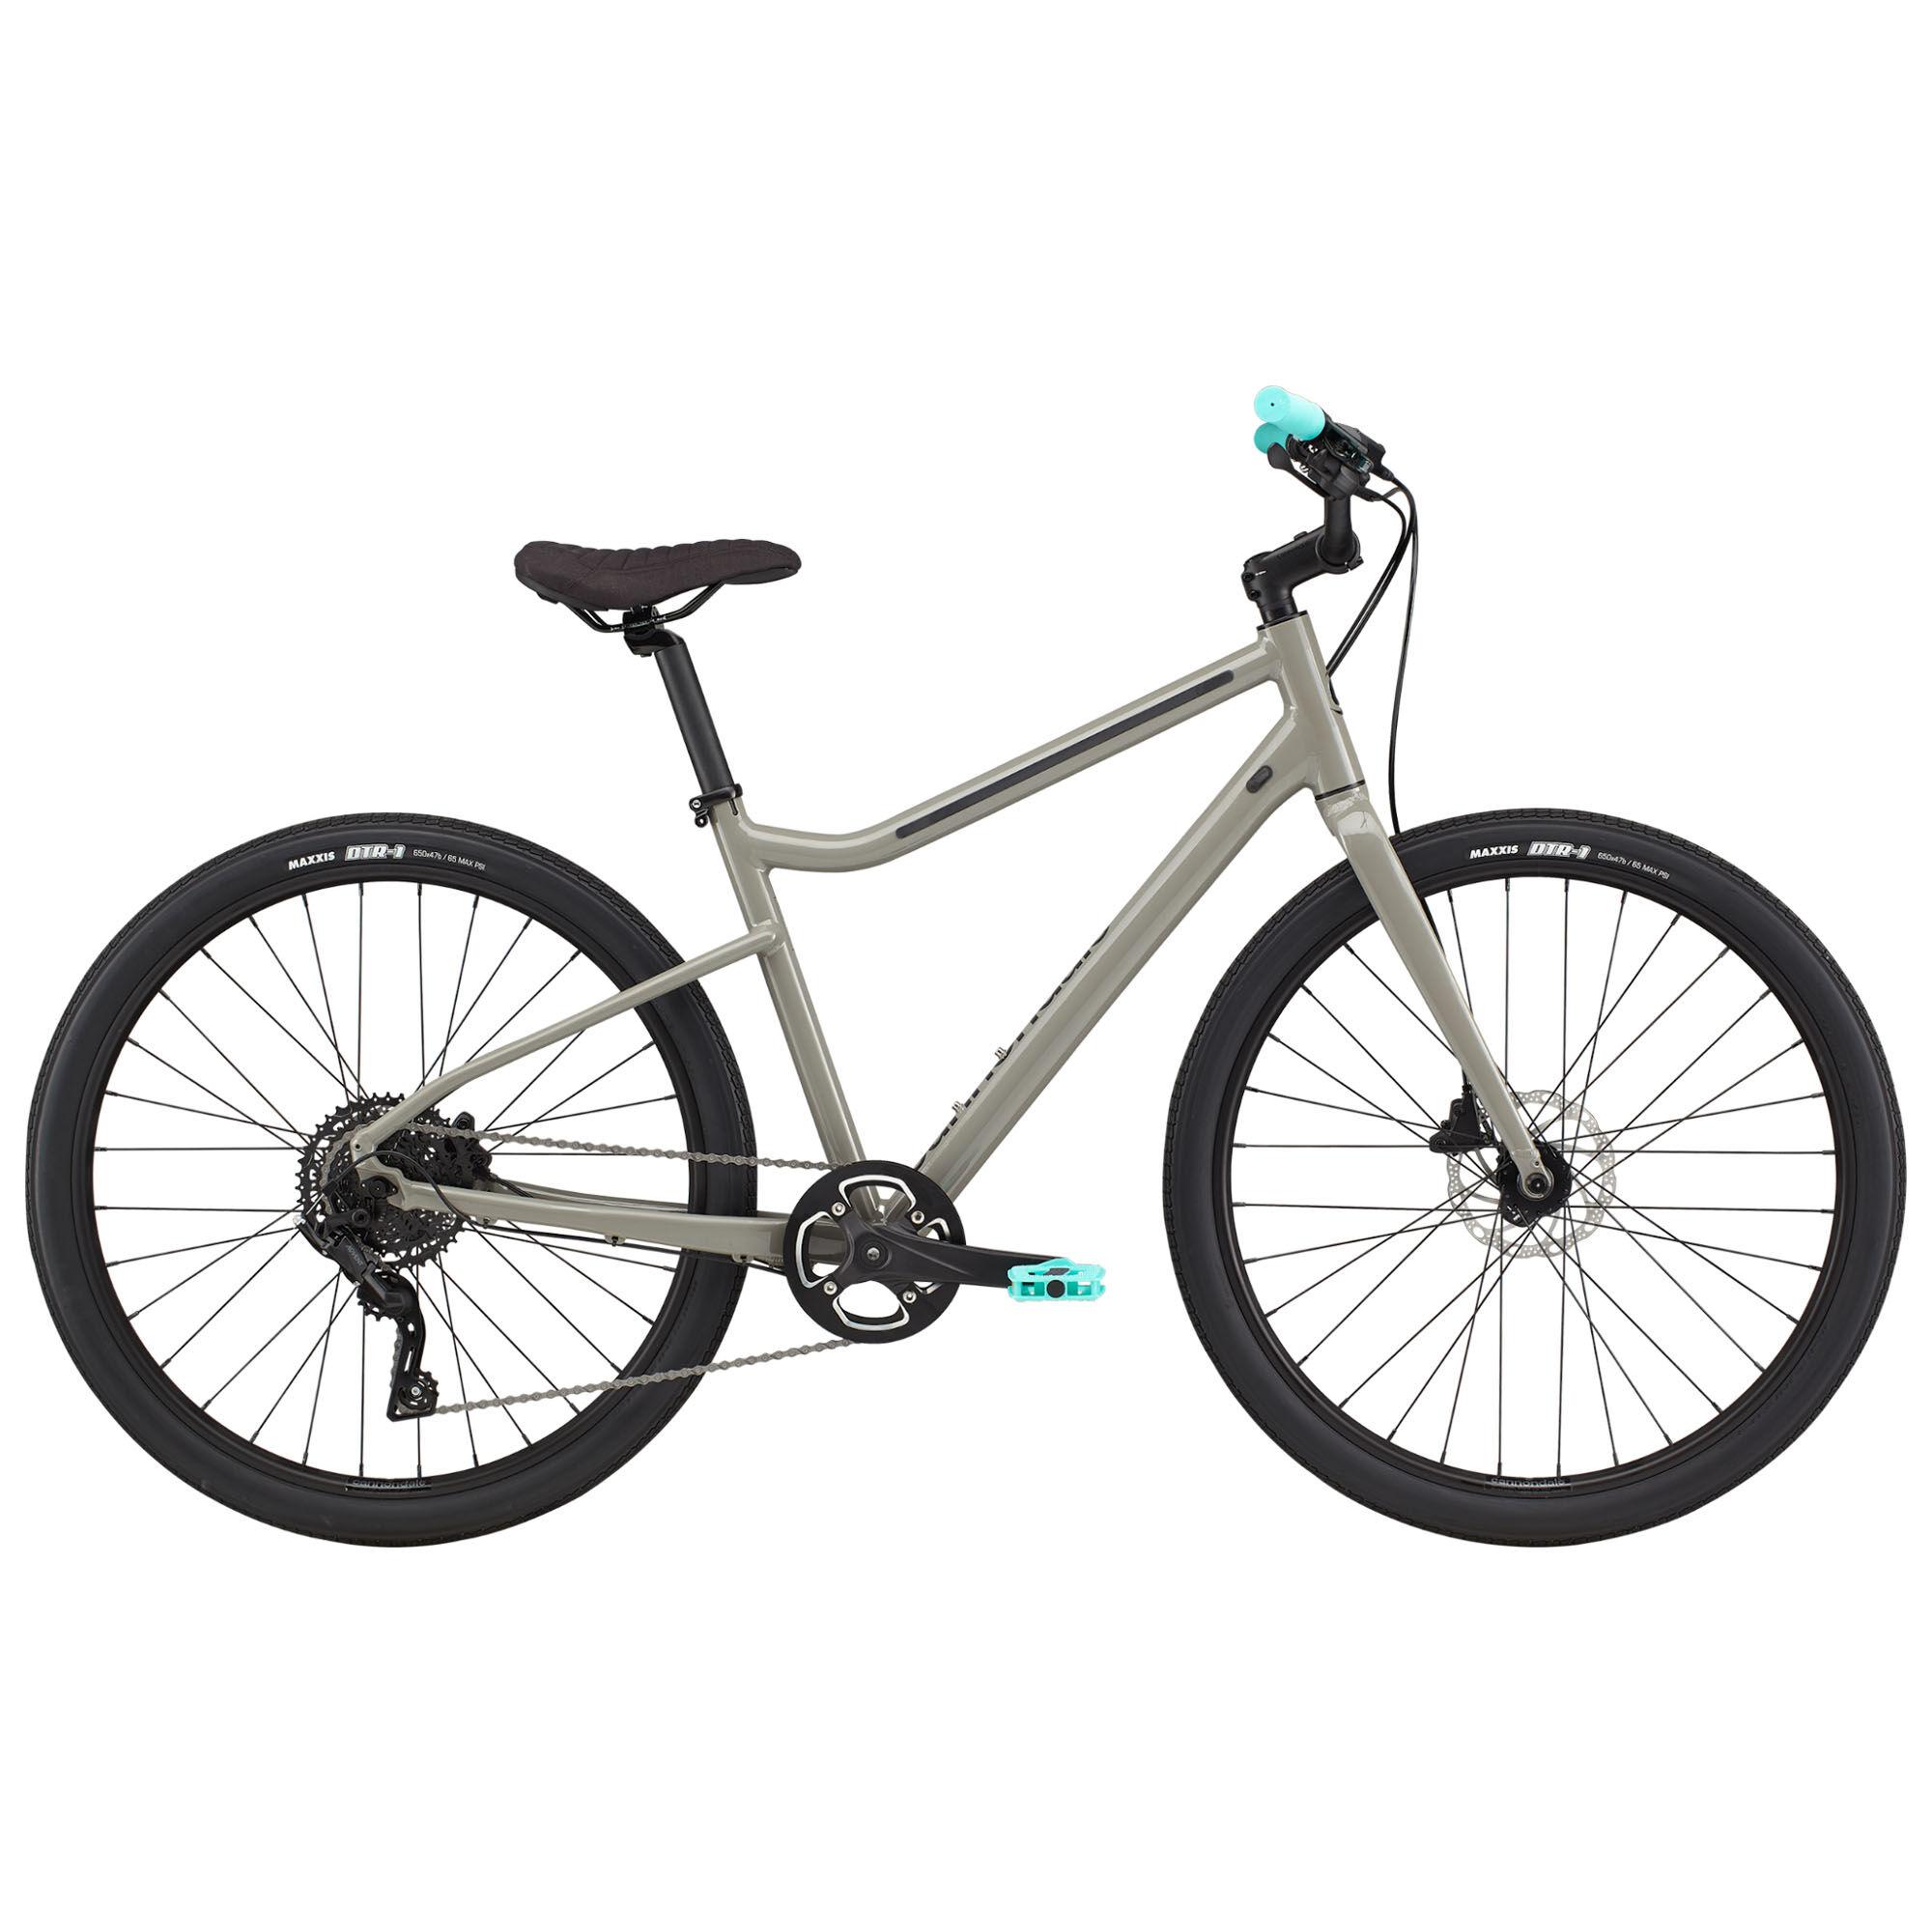 Cannondale Men's Treadwell 2 Urban Bike '21  - Stealth Grey - Size: Medium